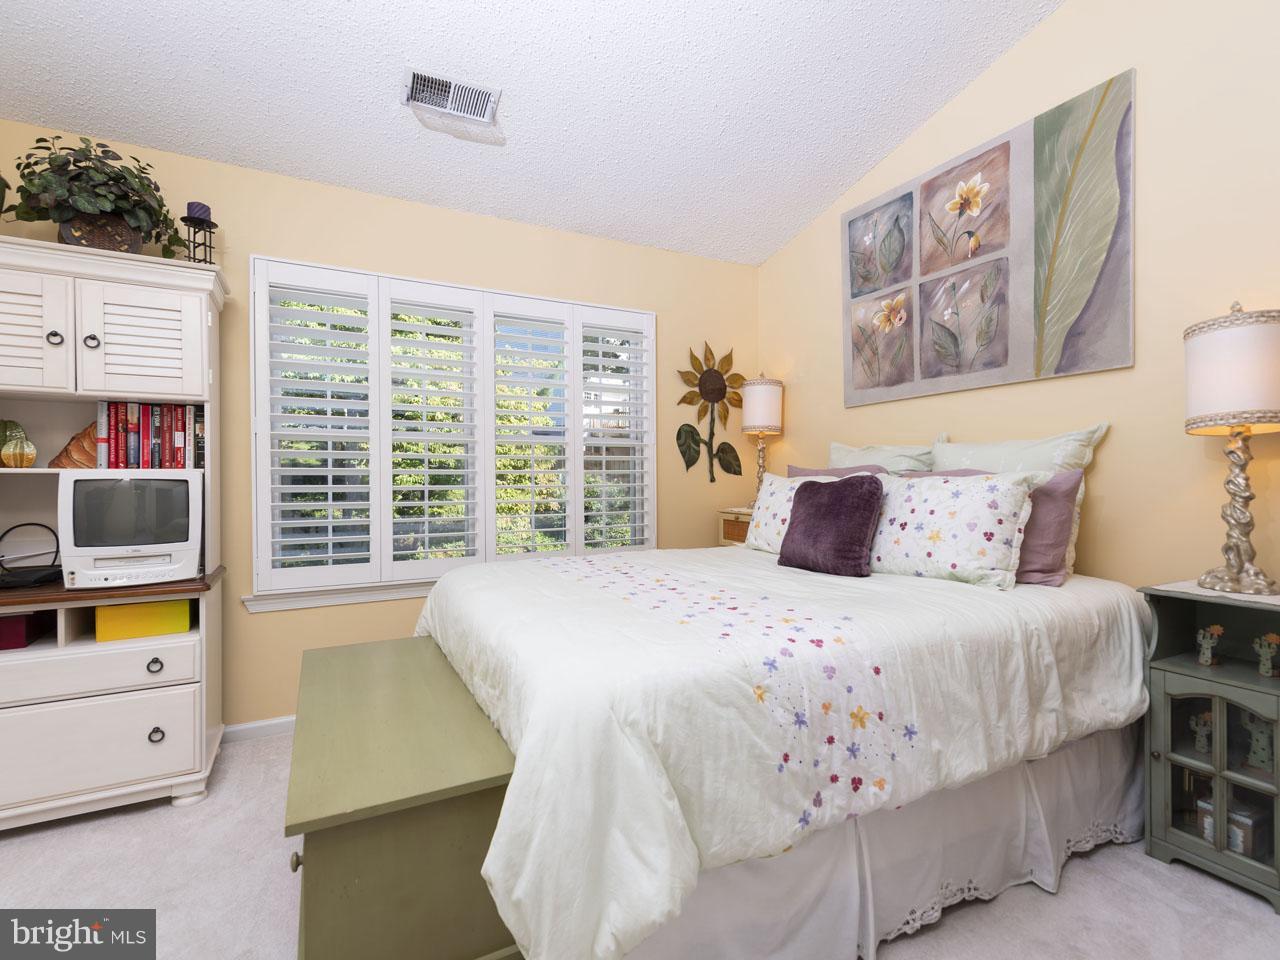 1002640508-300537941392-2021-07-22-05-00-37     Pinecrest   Alexandria Delaware Real Estate For Sale   MLS# 1002640508  - Best of Northern Virginia